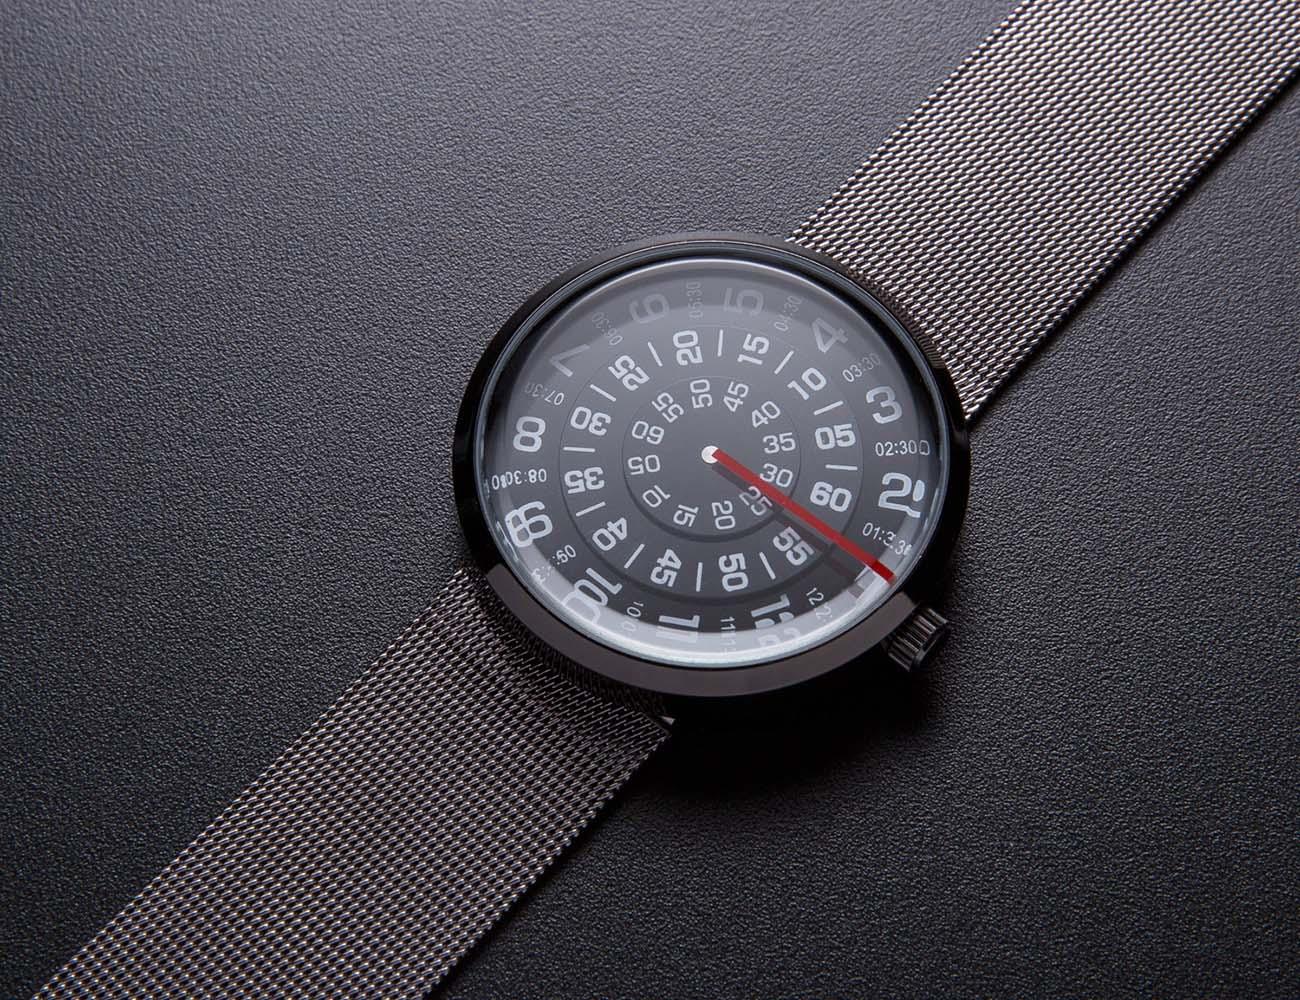 Futuristic watch by Mykonos design